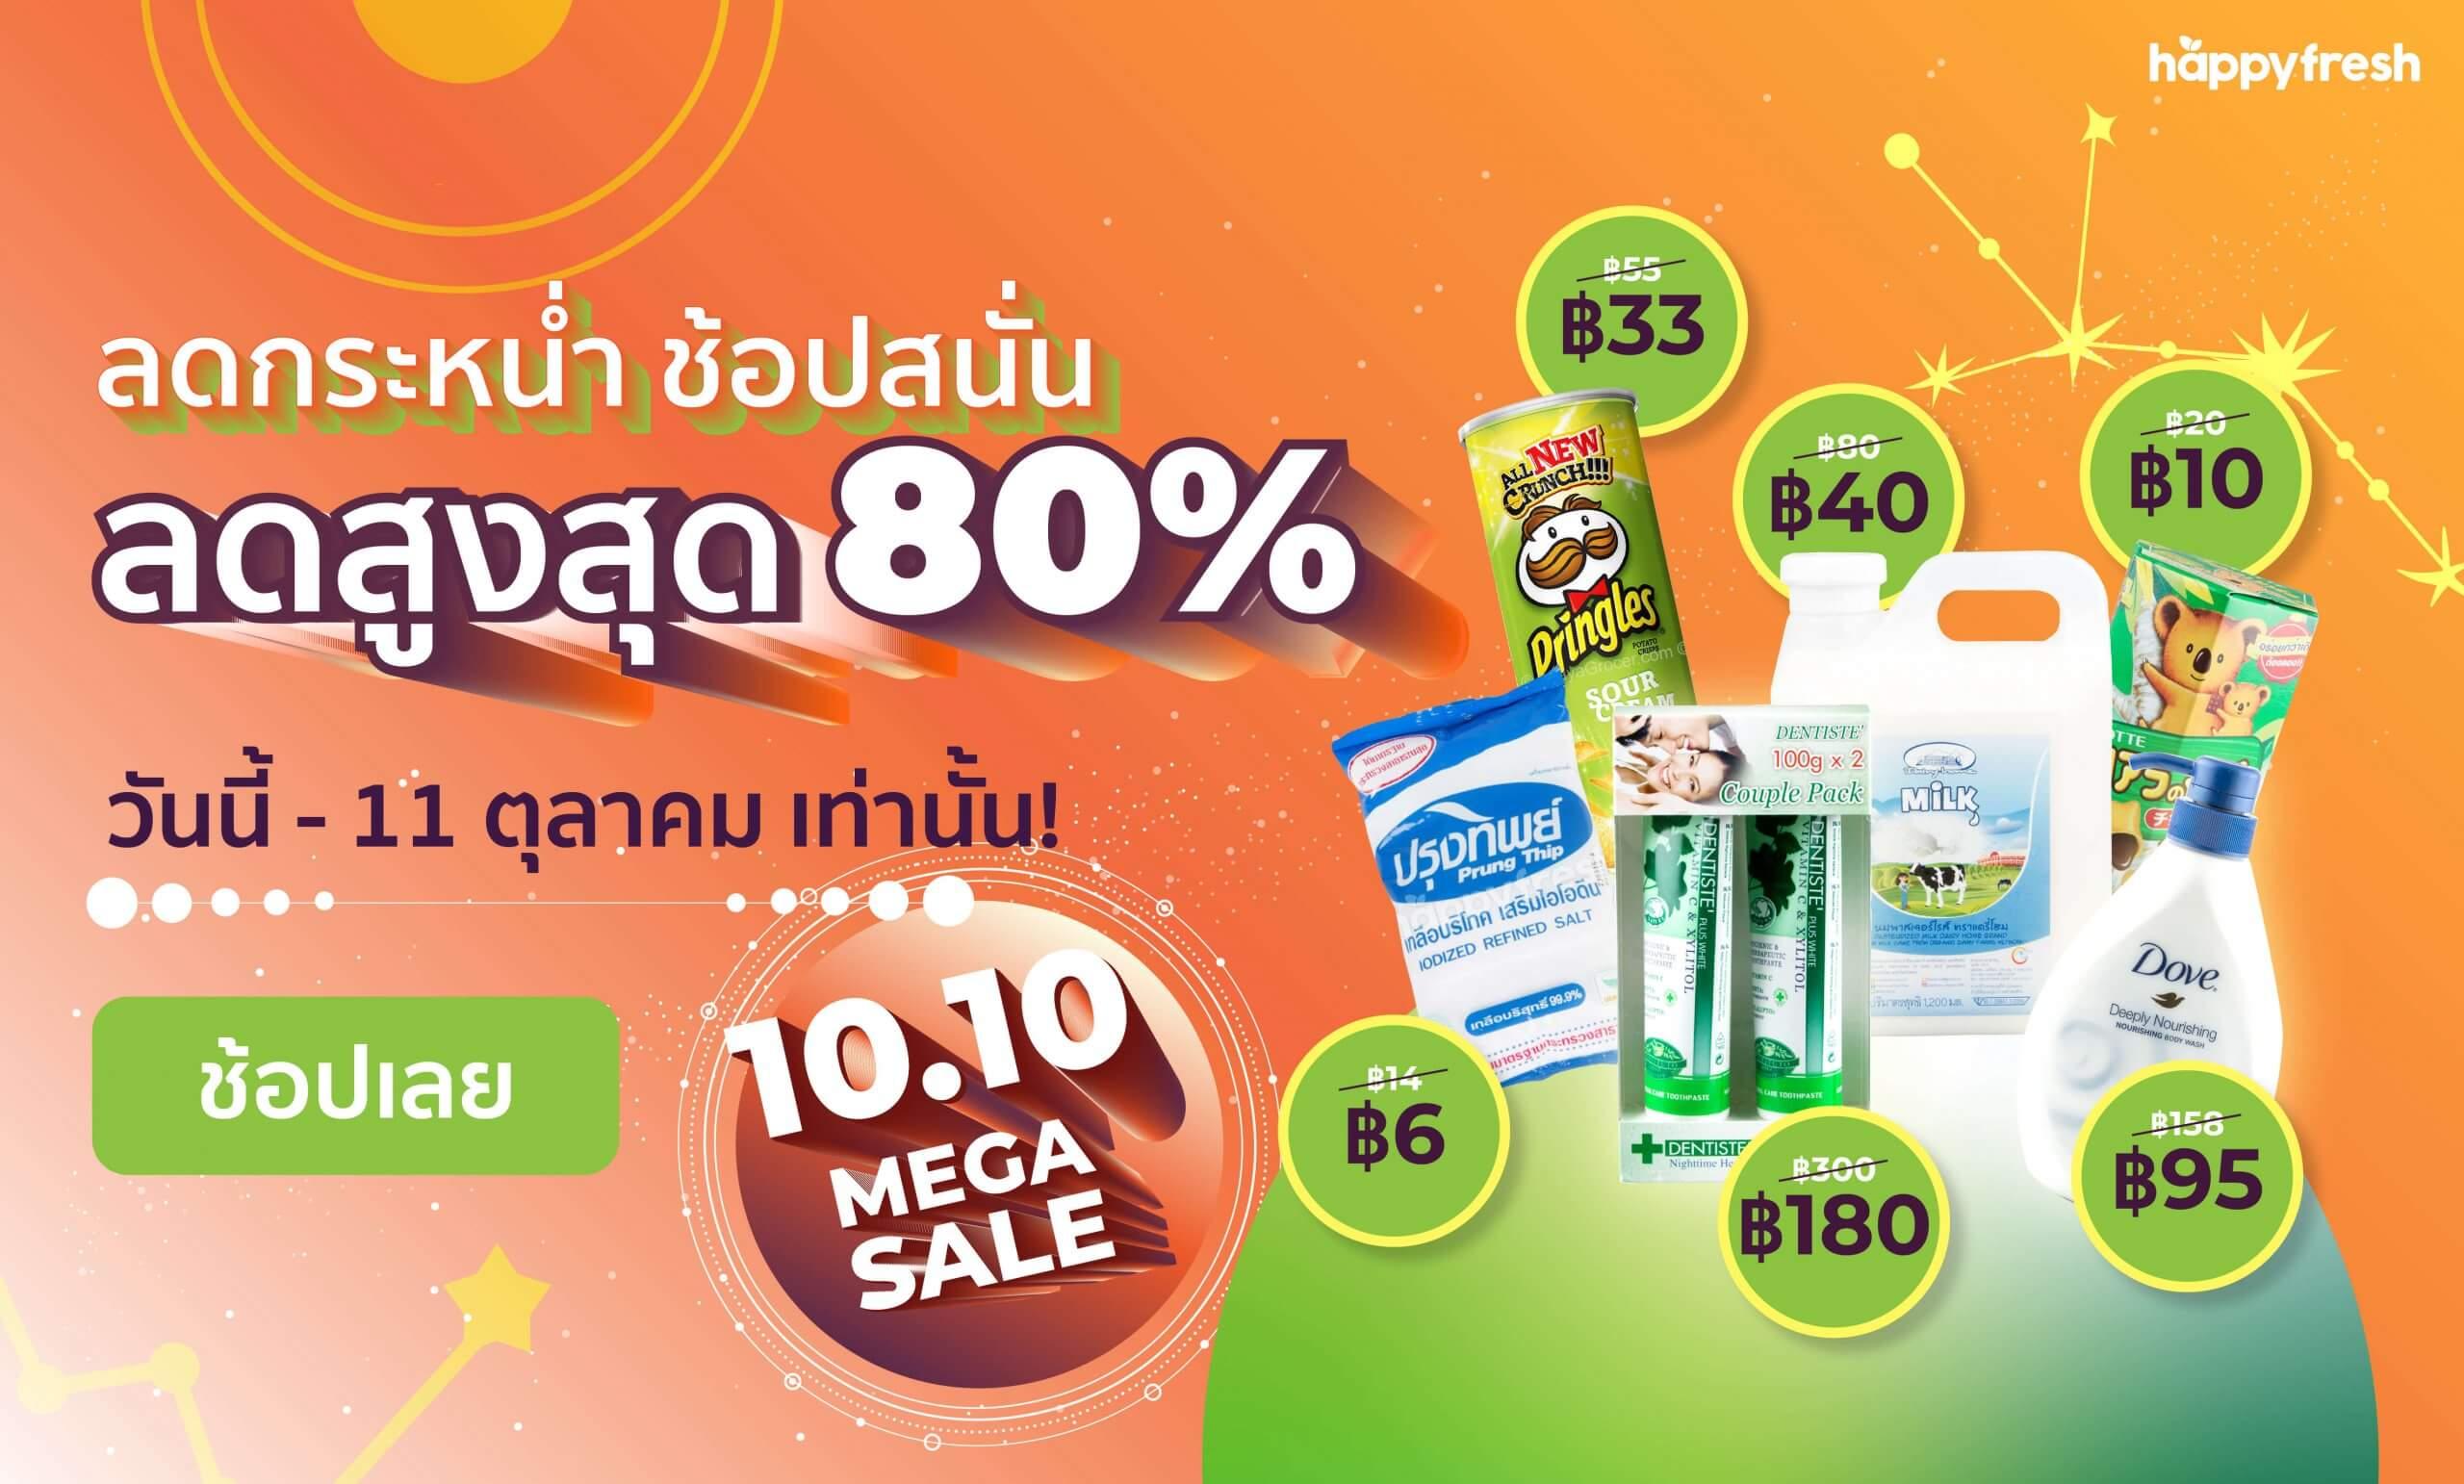 HappyFresh_Feature_Image_10_10_Mega_Sale_Lotus_Big_C_80_Percent_Up